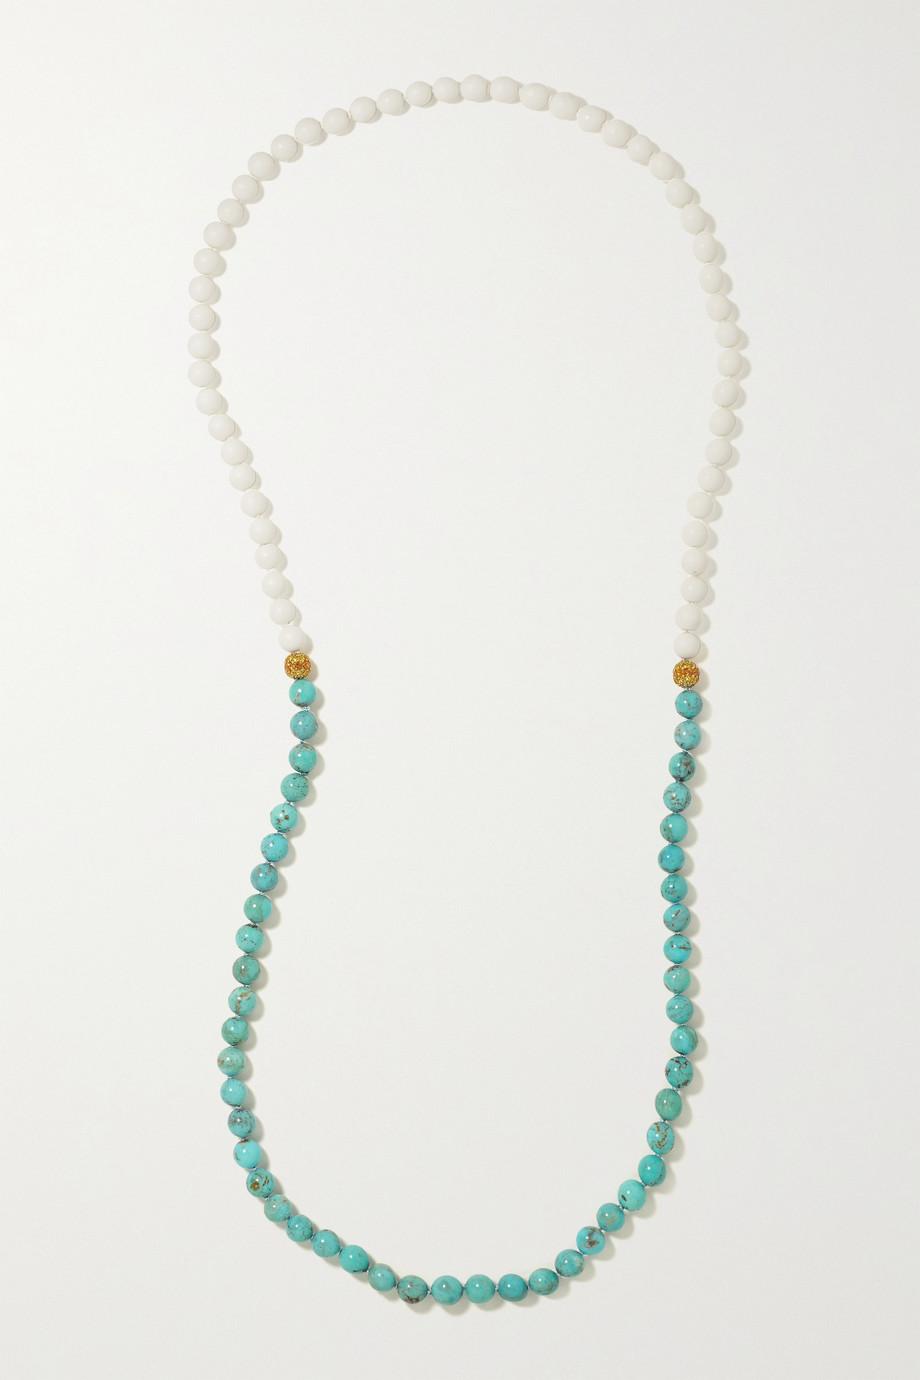 Emily P. Wheeler + NET SUSTAIN 18-karat recycled gold multi-stone necklace